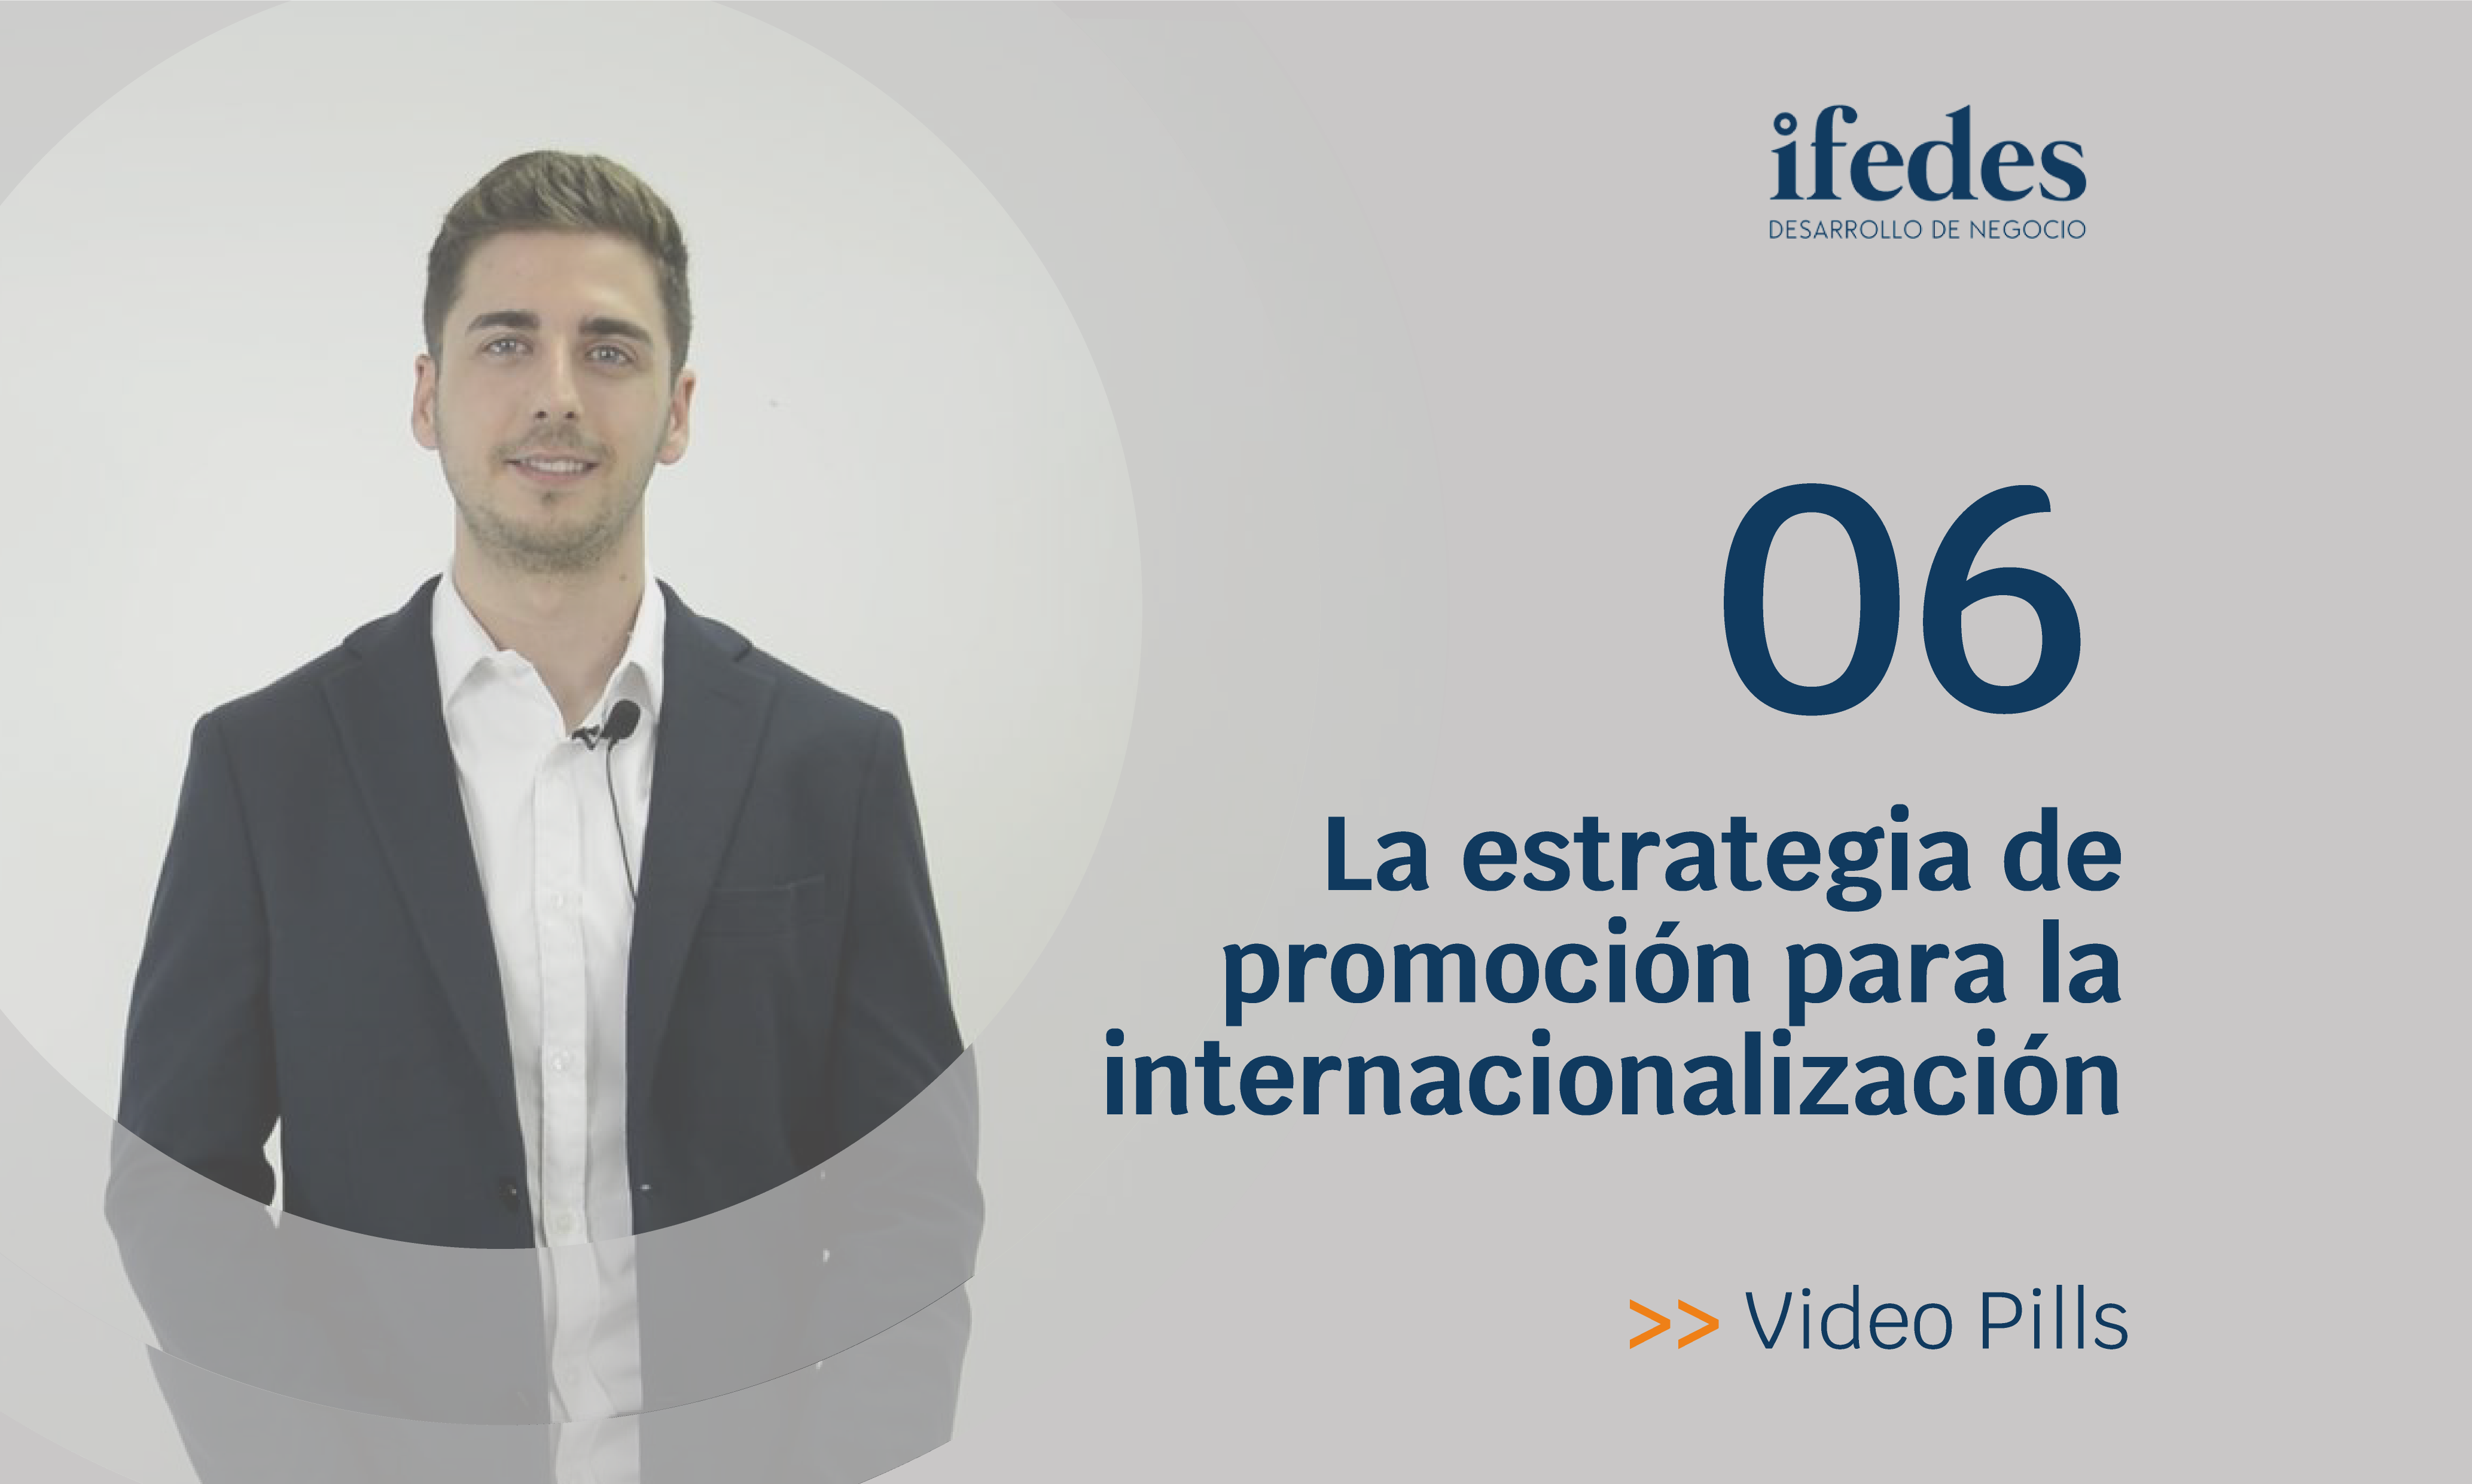 Estrategia promocion videopills Sergio Garcia ifedes